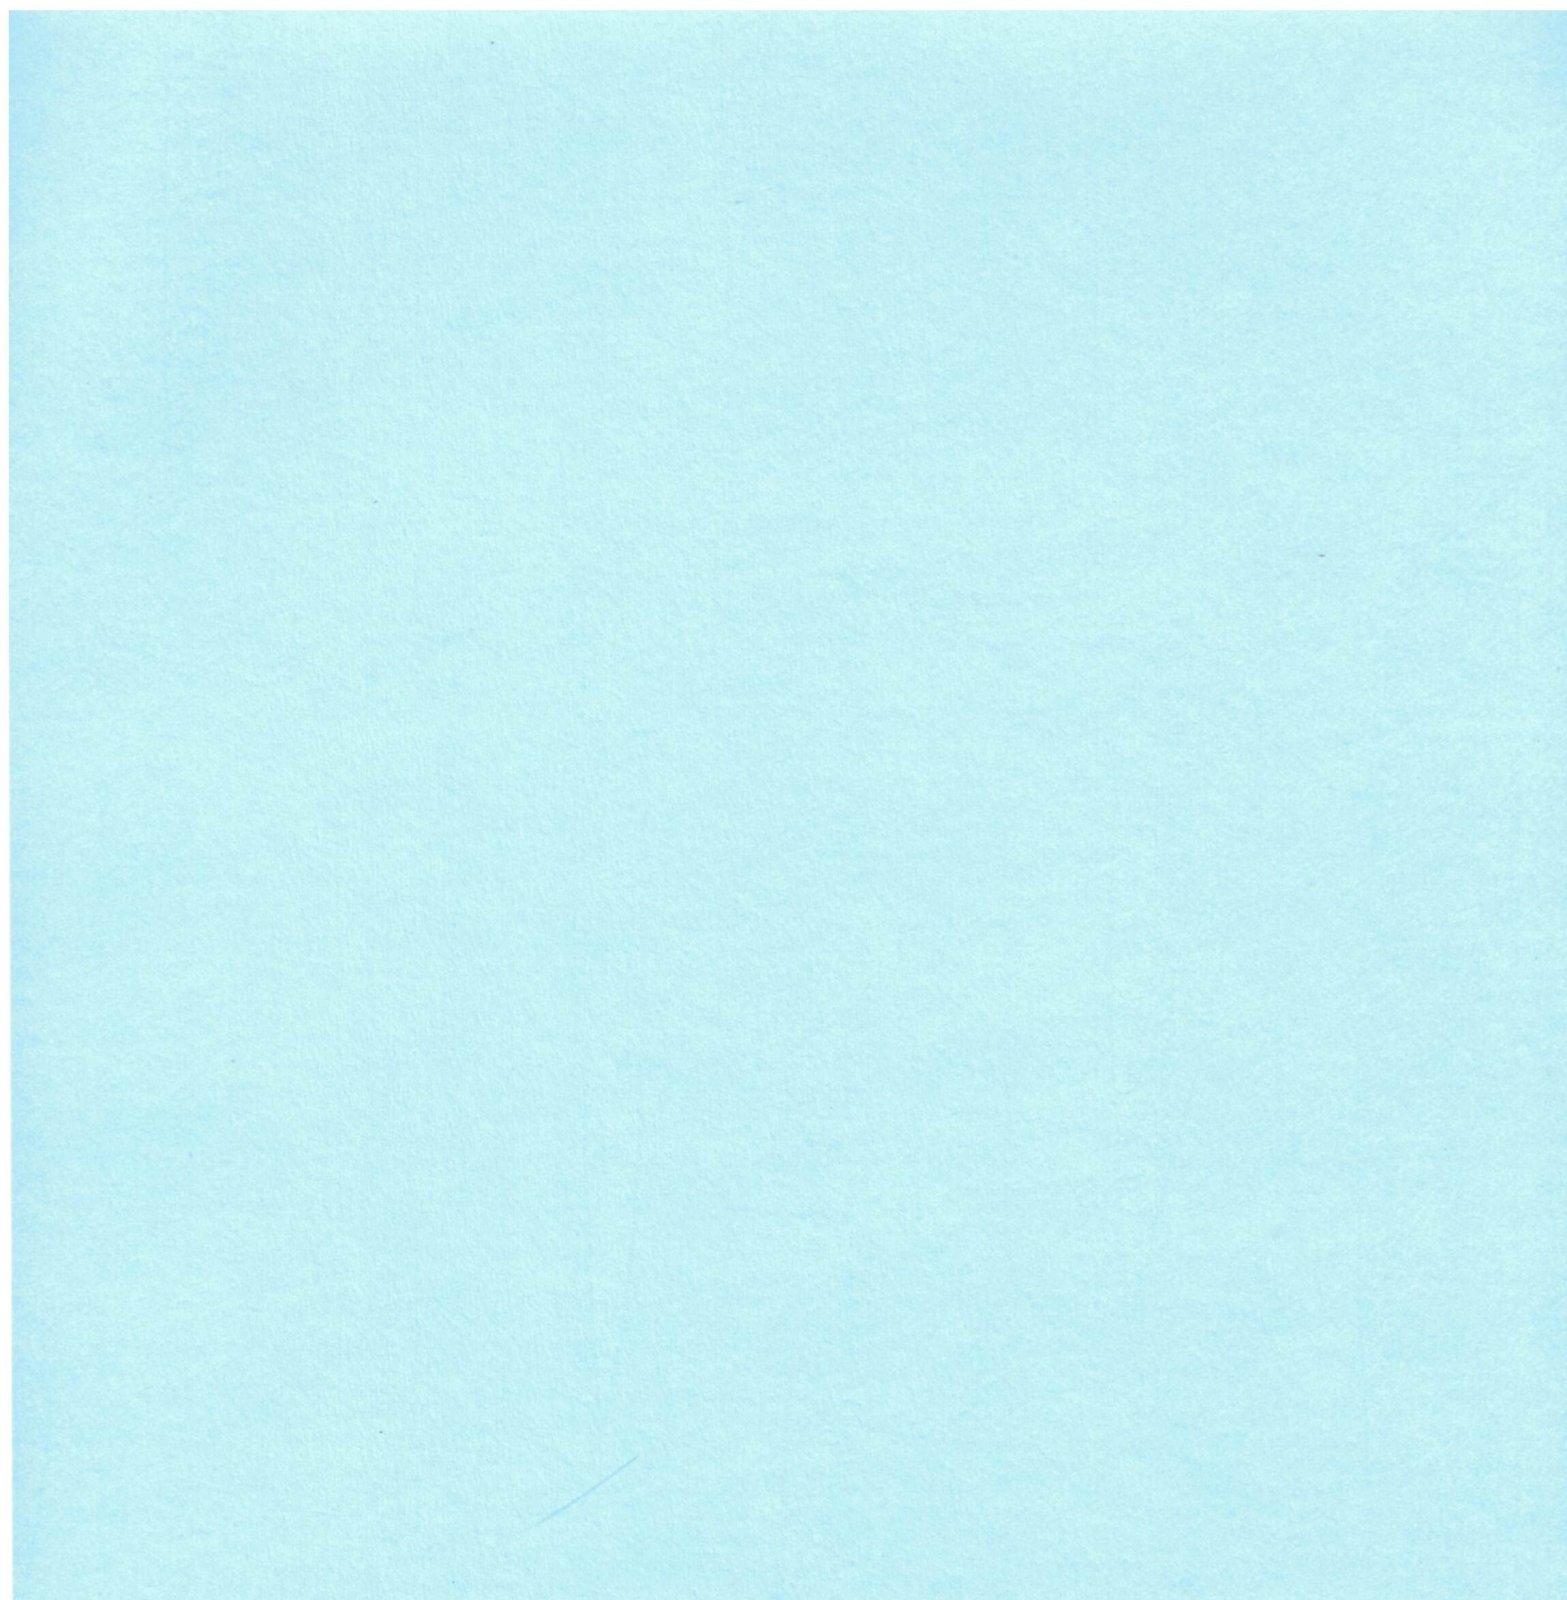 AC Cardstock 12X12 doux/lisse Bleu Lagon 80lbs - Smooth Cardstock, Blue lagoon Item # 71780